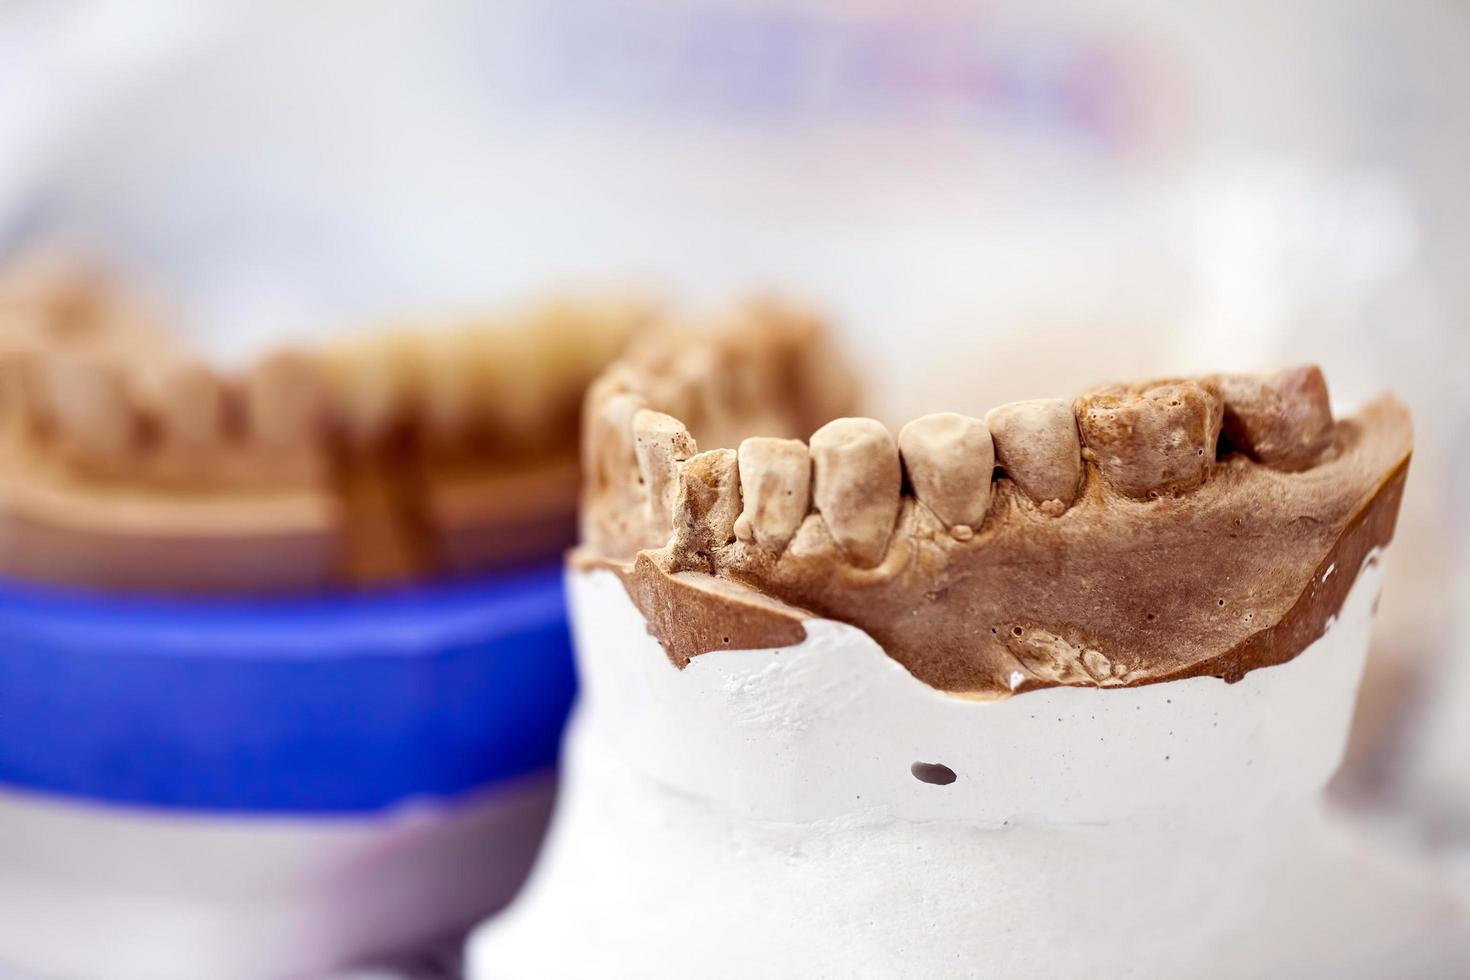 Zirconium Porcelain Tooth plate photo